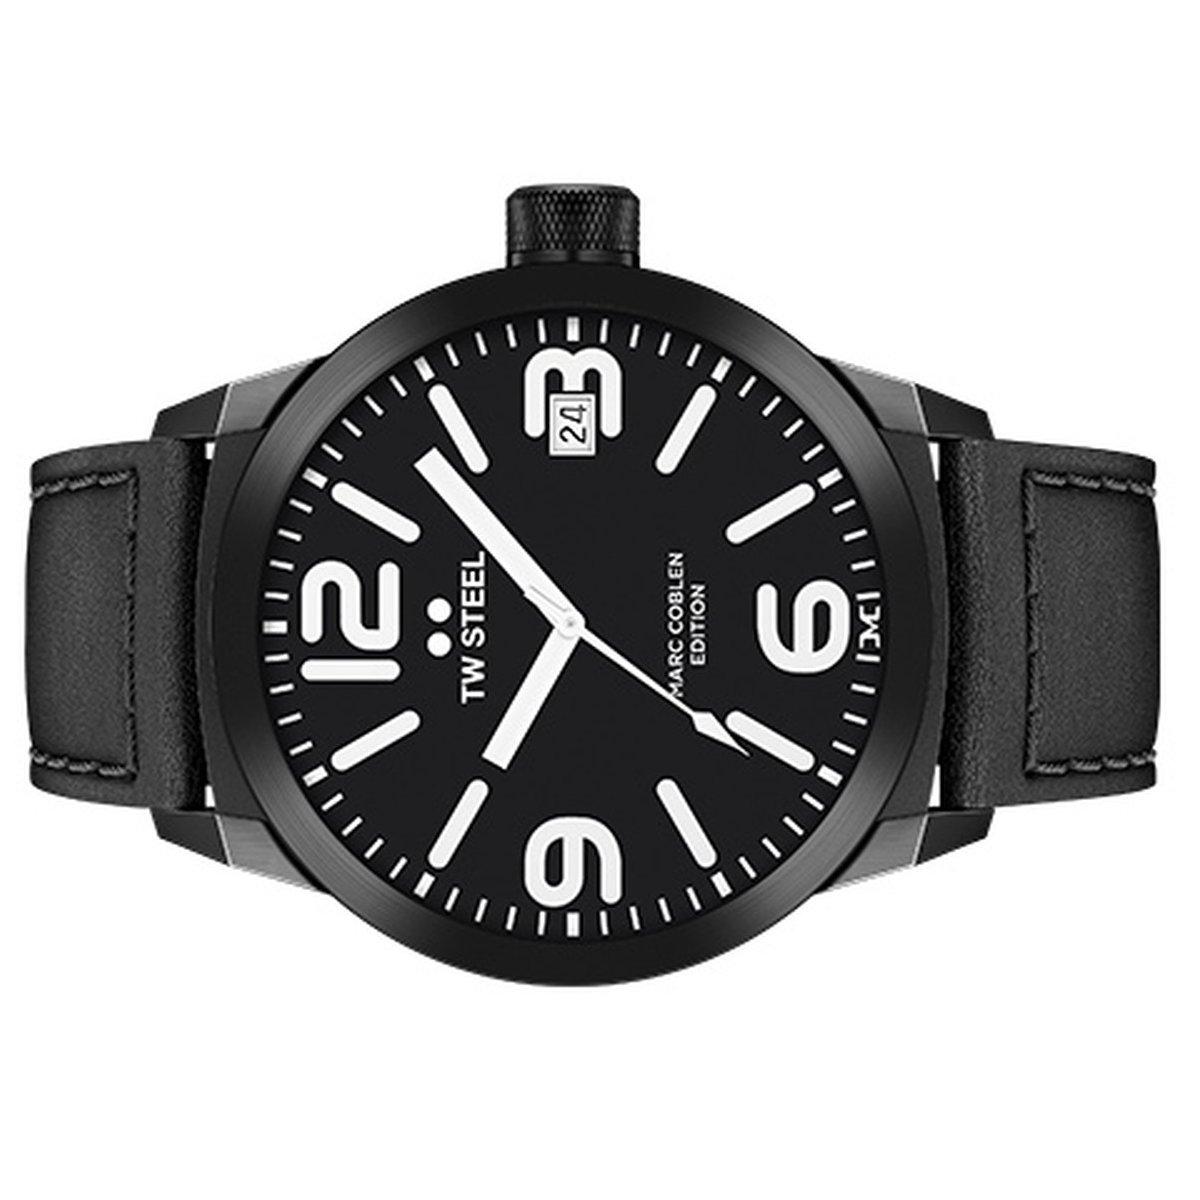 tw steel herren uhr armbanduhr marc coblen edition twmc55. Black Bedroom Furniture Sets. Home Design Ideas